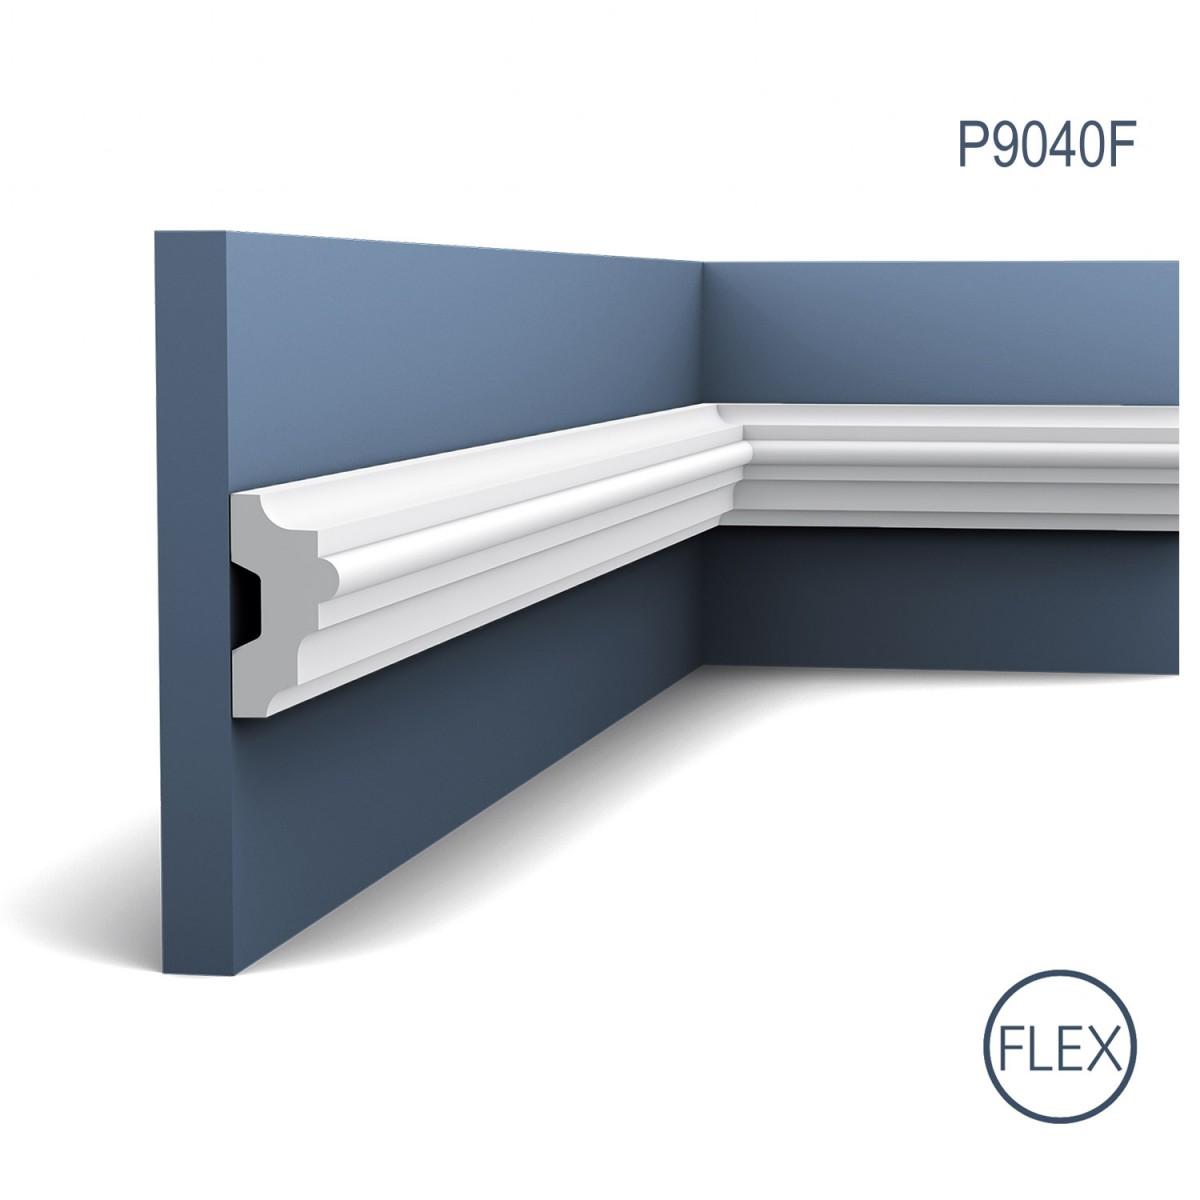 Brau Flex Luxxus P9040F, Dimensiuni: 200 X 5 X 2.5 cm, Orac Decor